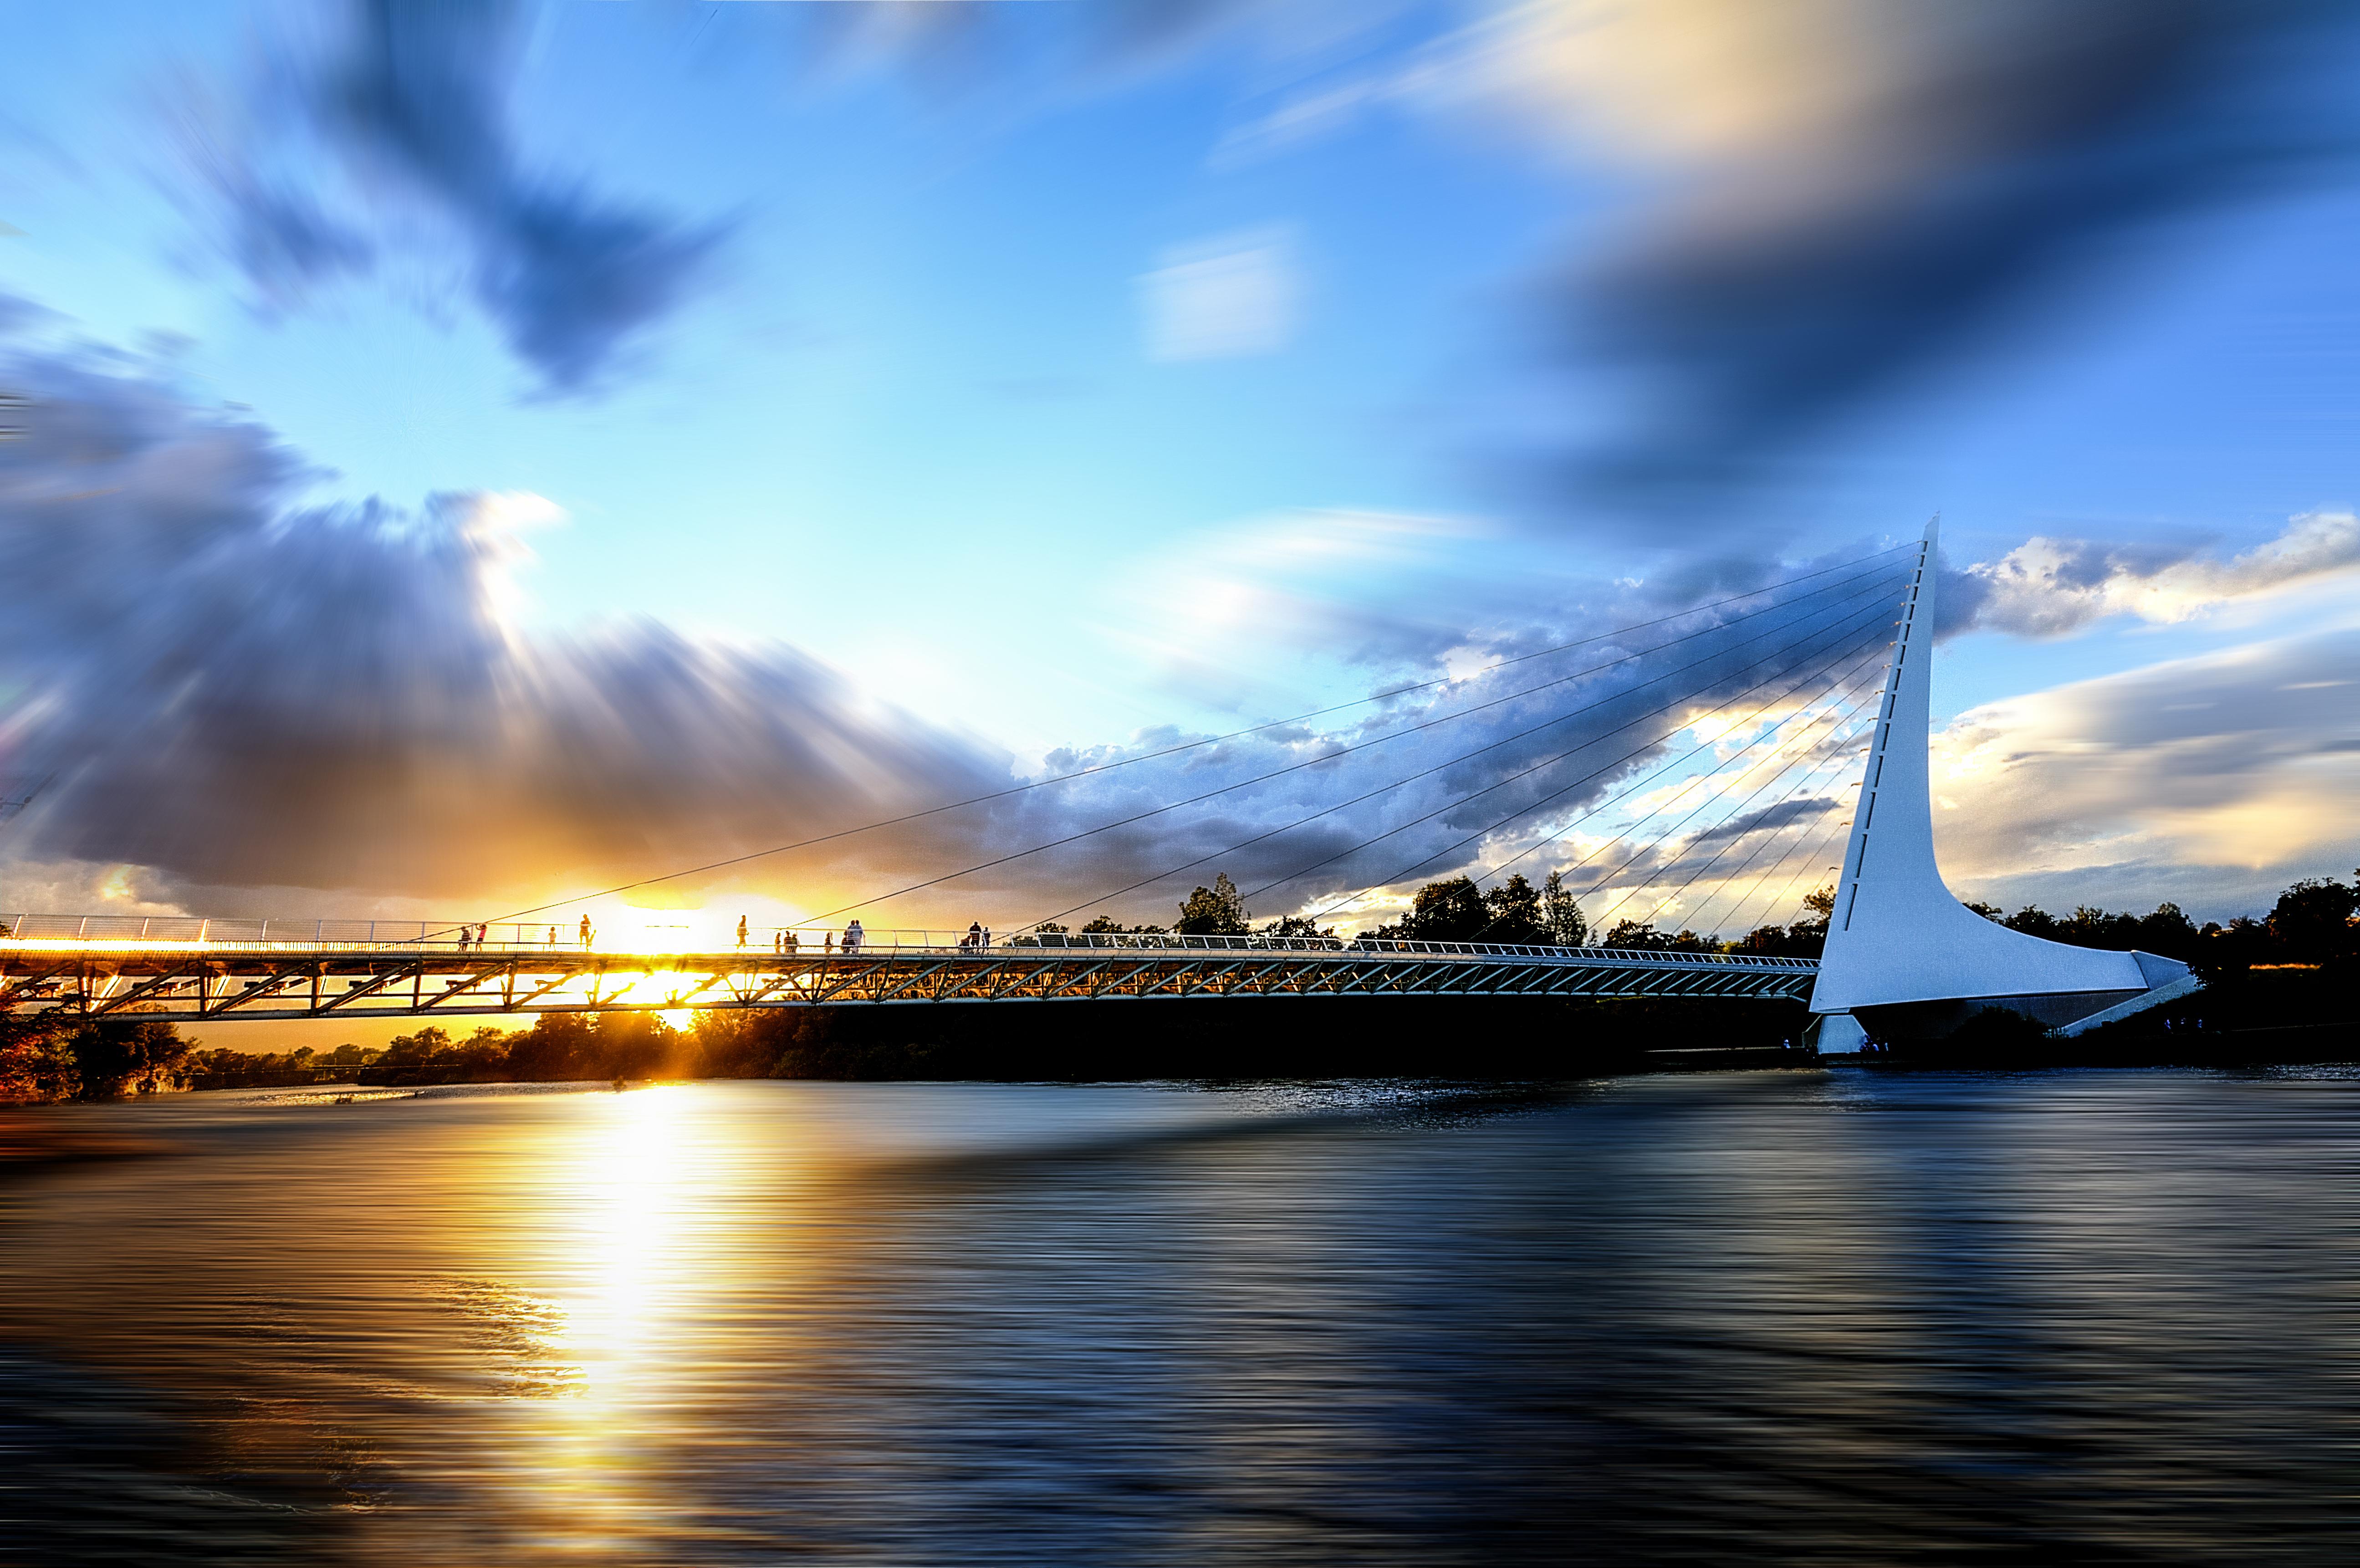 Sun_Dial_Bridge,_Redding,_CA,_USA.jpg